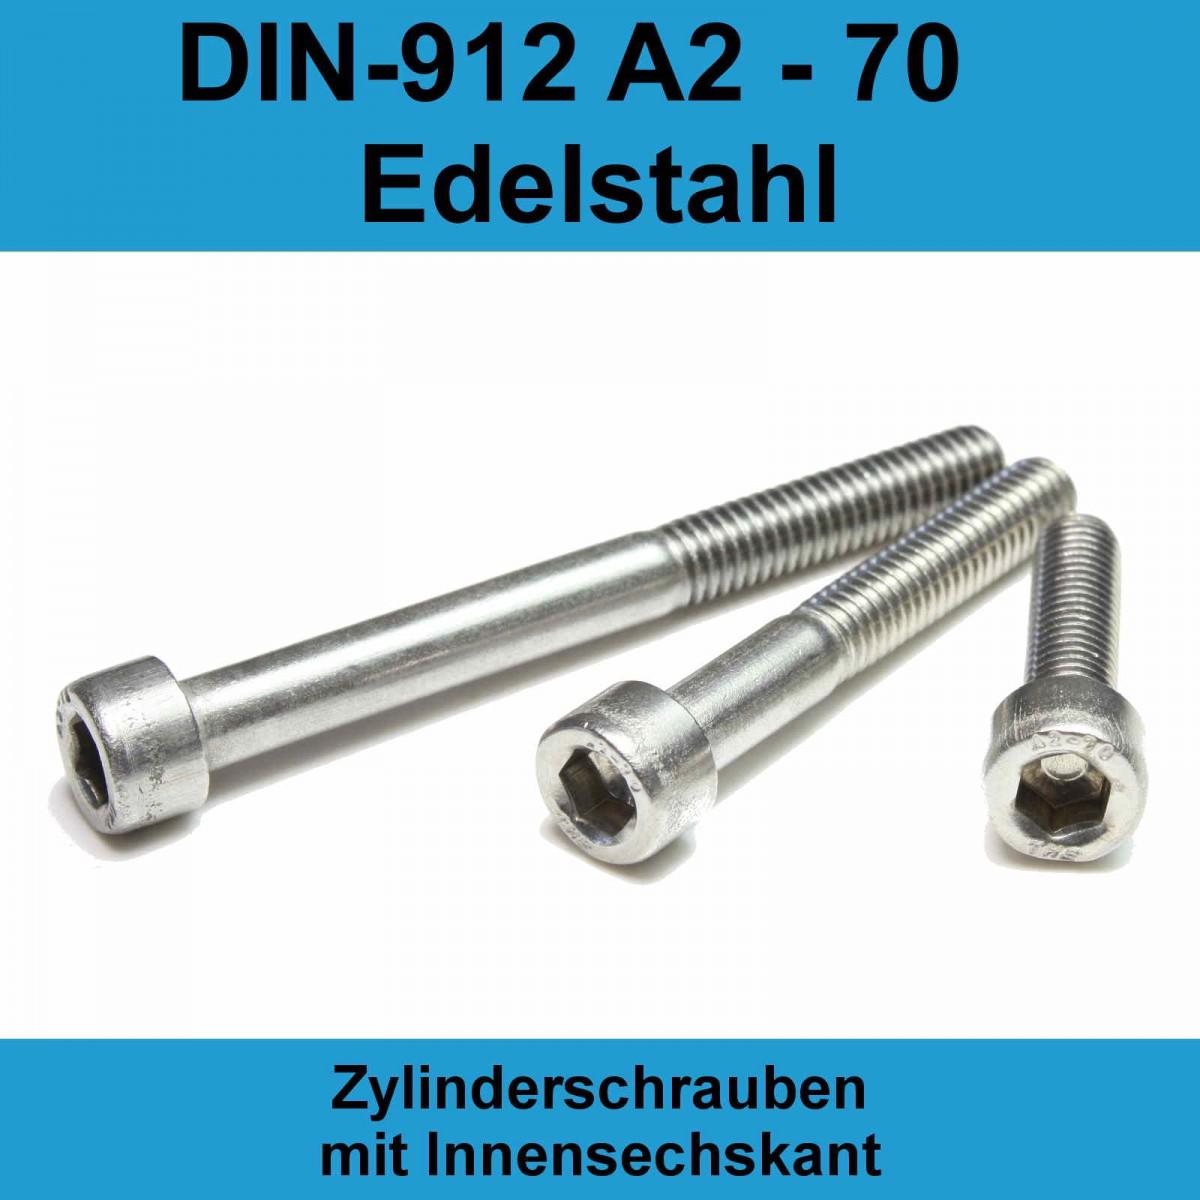 5* Edelstahl V2A Schrauben DIN 912 Innensechskant M10 x 35 mm*